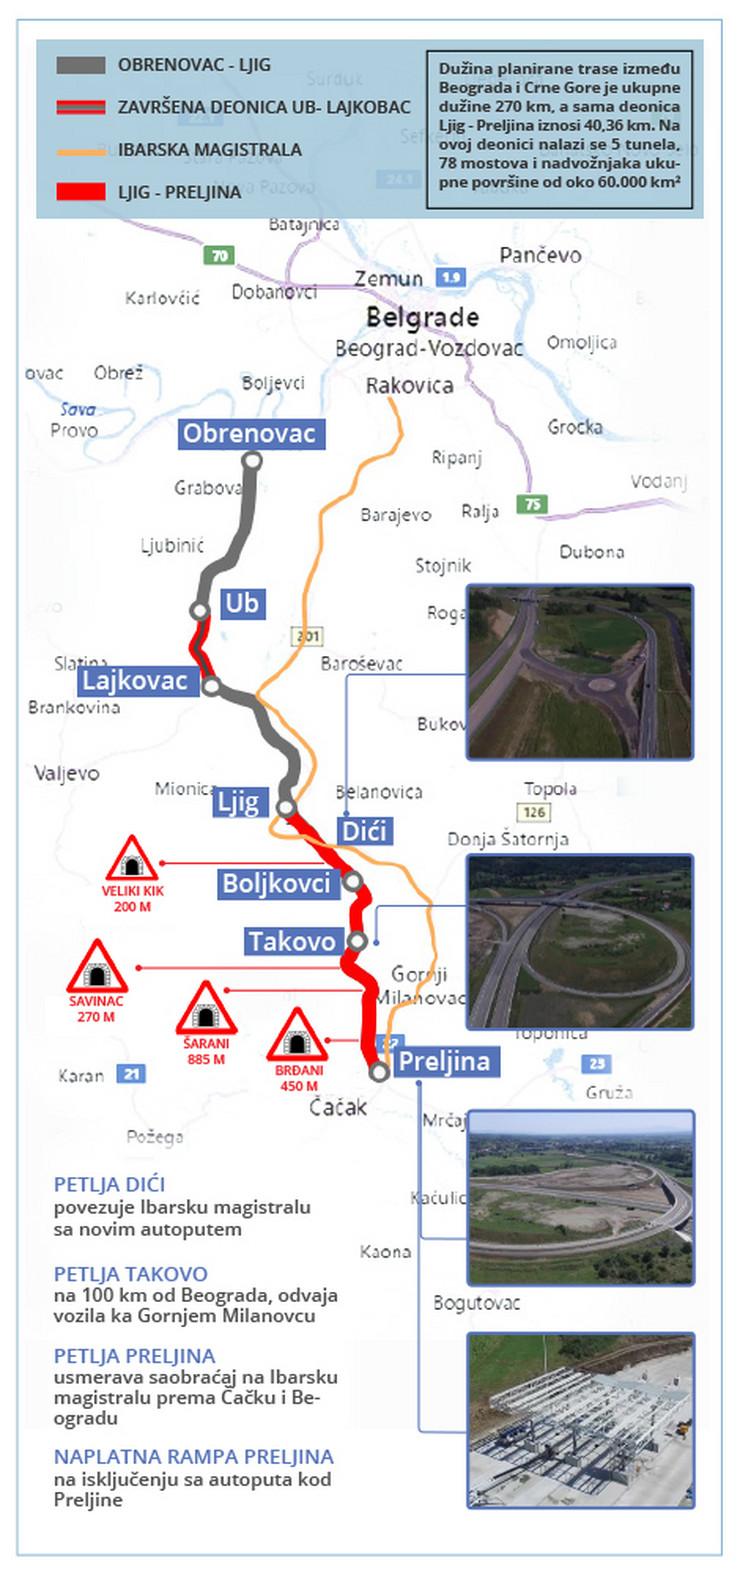 žorža klemansoa 19 beograd mapa ZATVARA SE PRSTEN Deonica Surčin Obrenovac gotova za tri godine  žorža klemansoa 19 beograd mapa